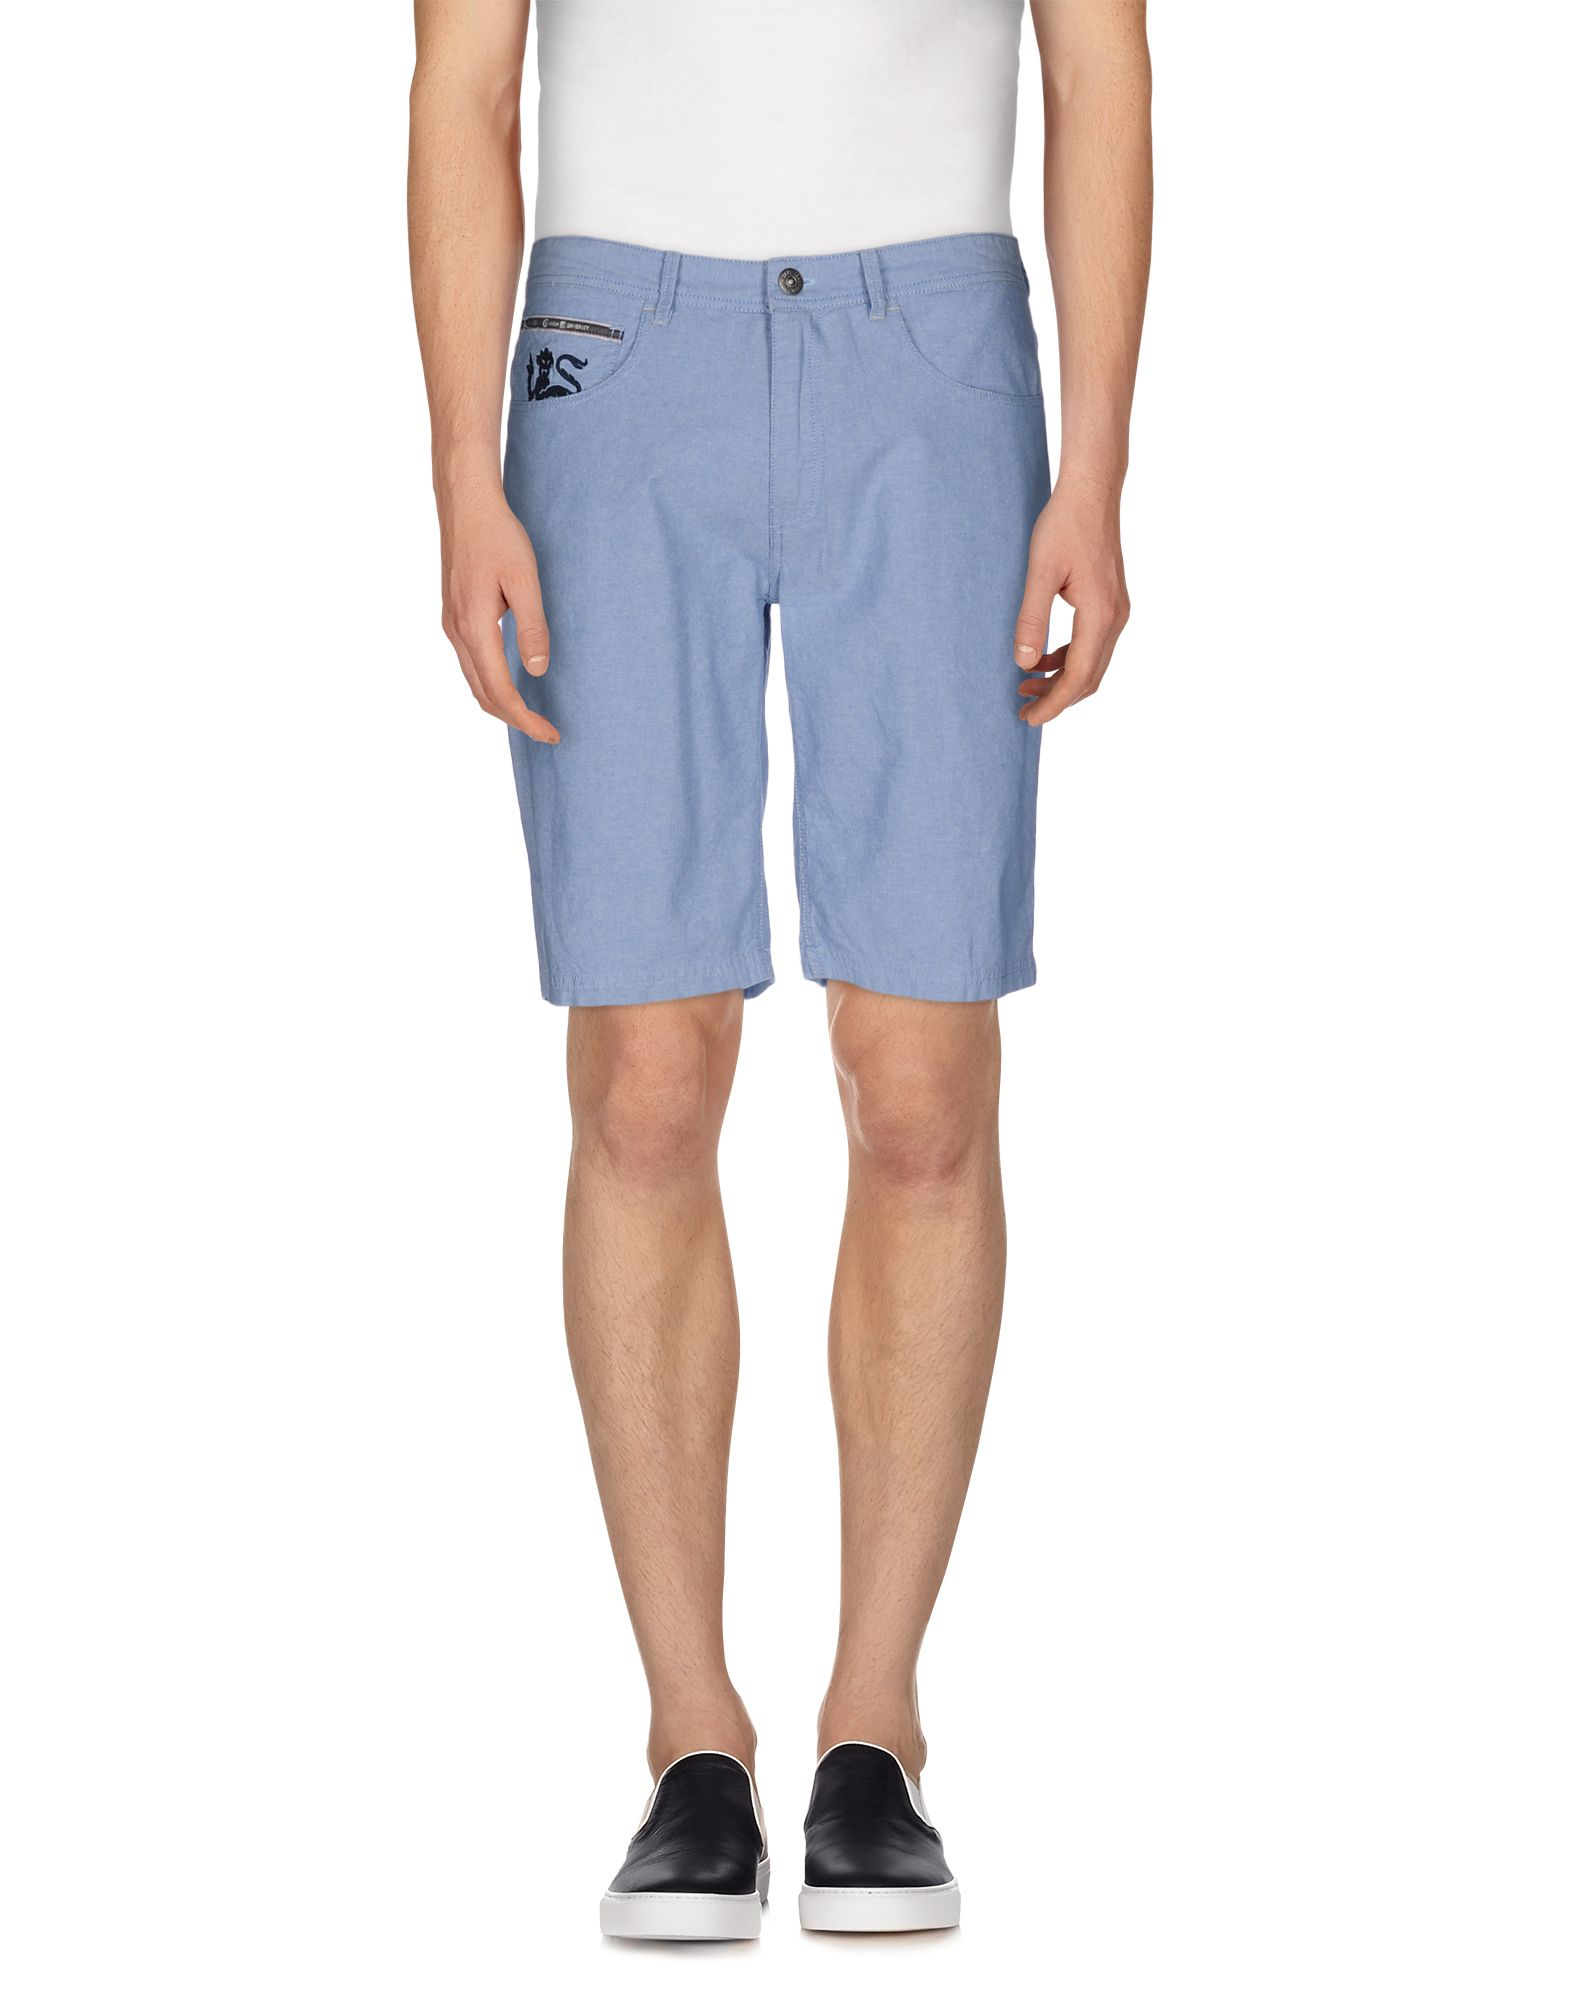 pepe jeans bermuda shorts in blue for men lyst. Black Bedroom Furniture Sets. Home Design Ideas